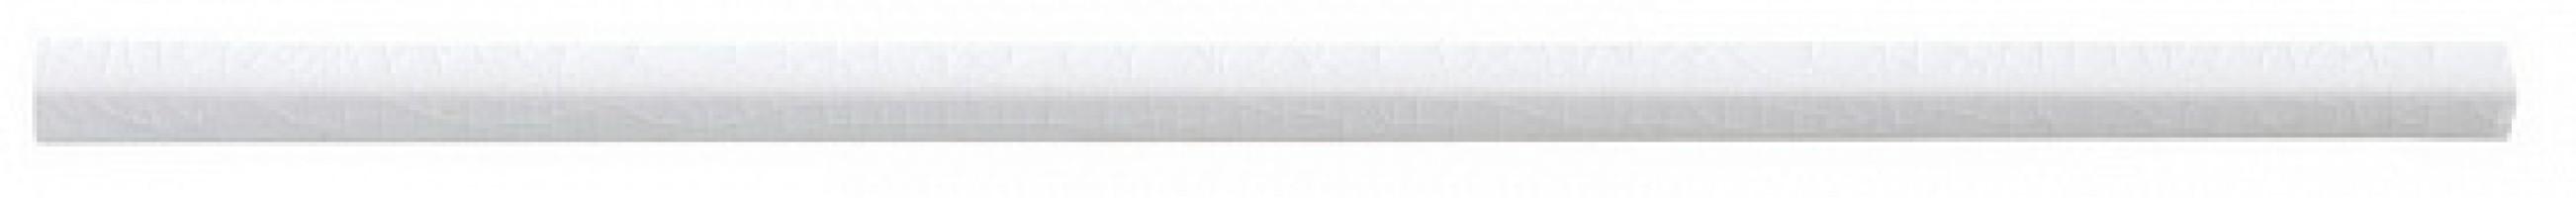 Бордюр Modernista ADMO5450 Bullnose Trim C/C Cadet Gray 0.85x20 Adex